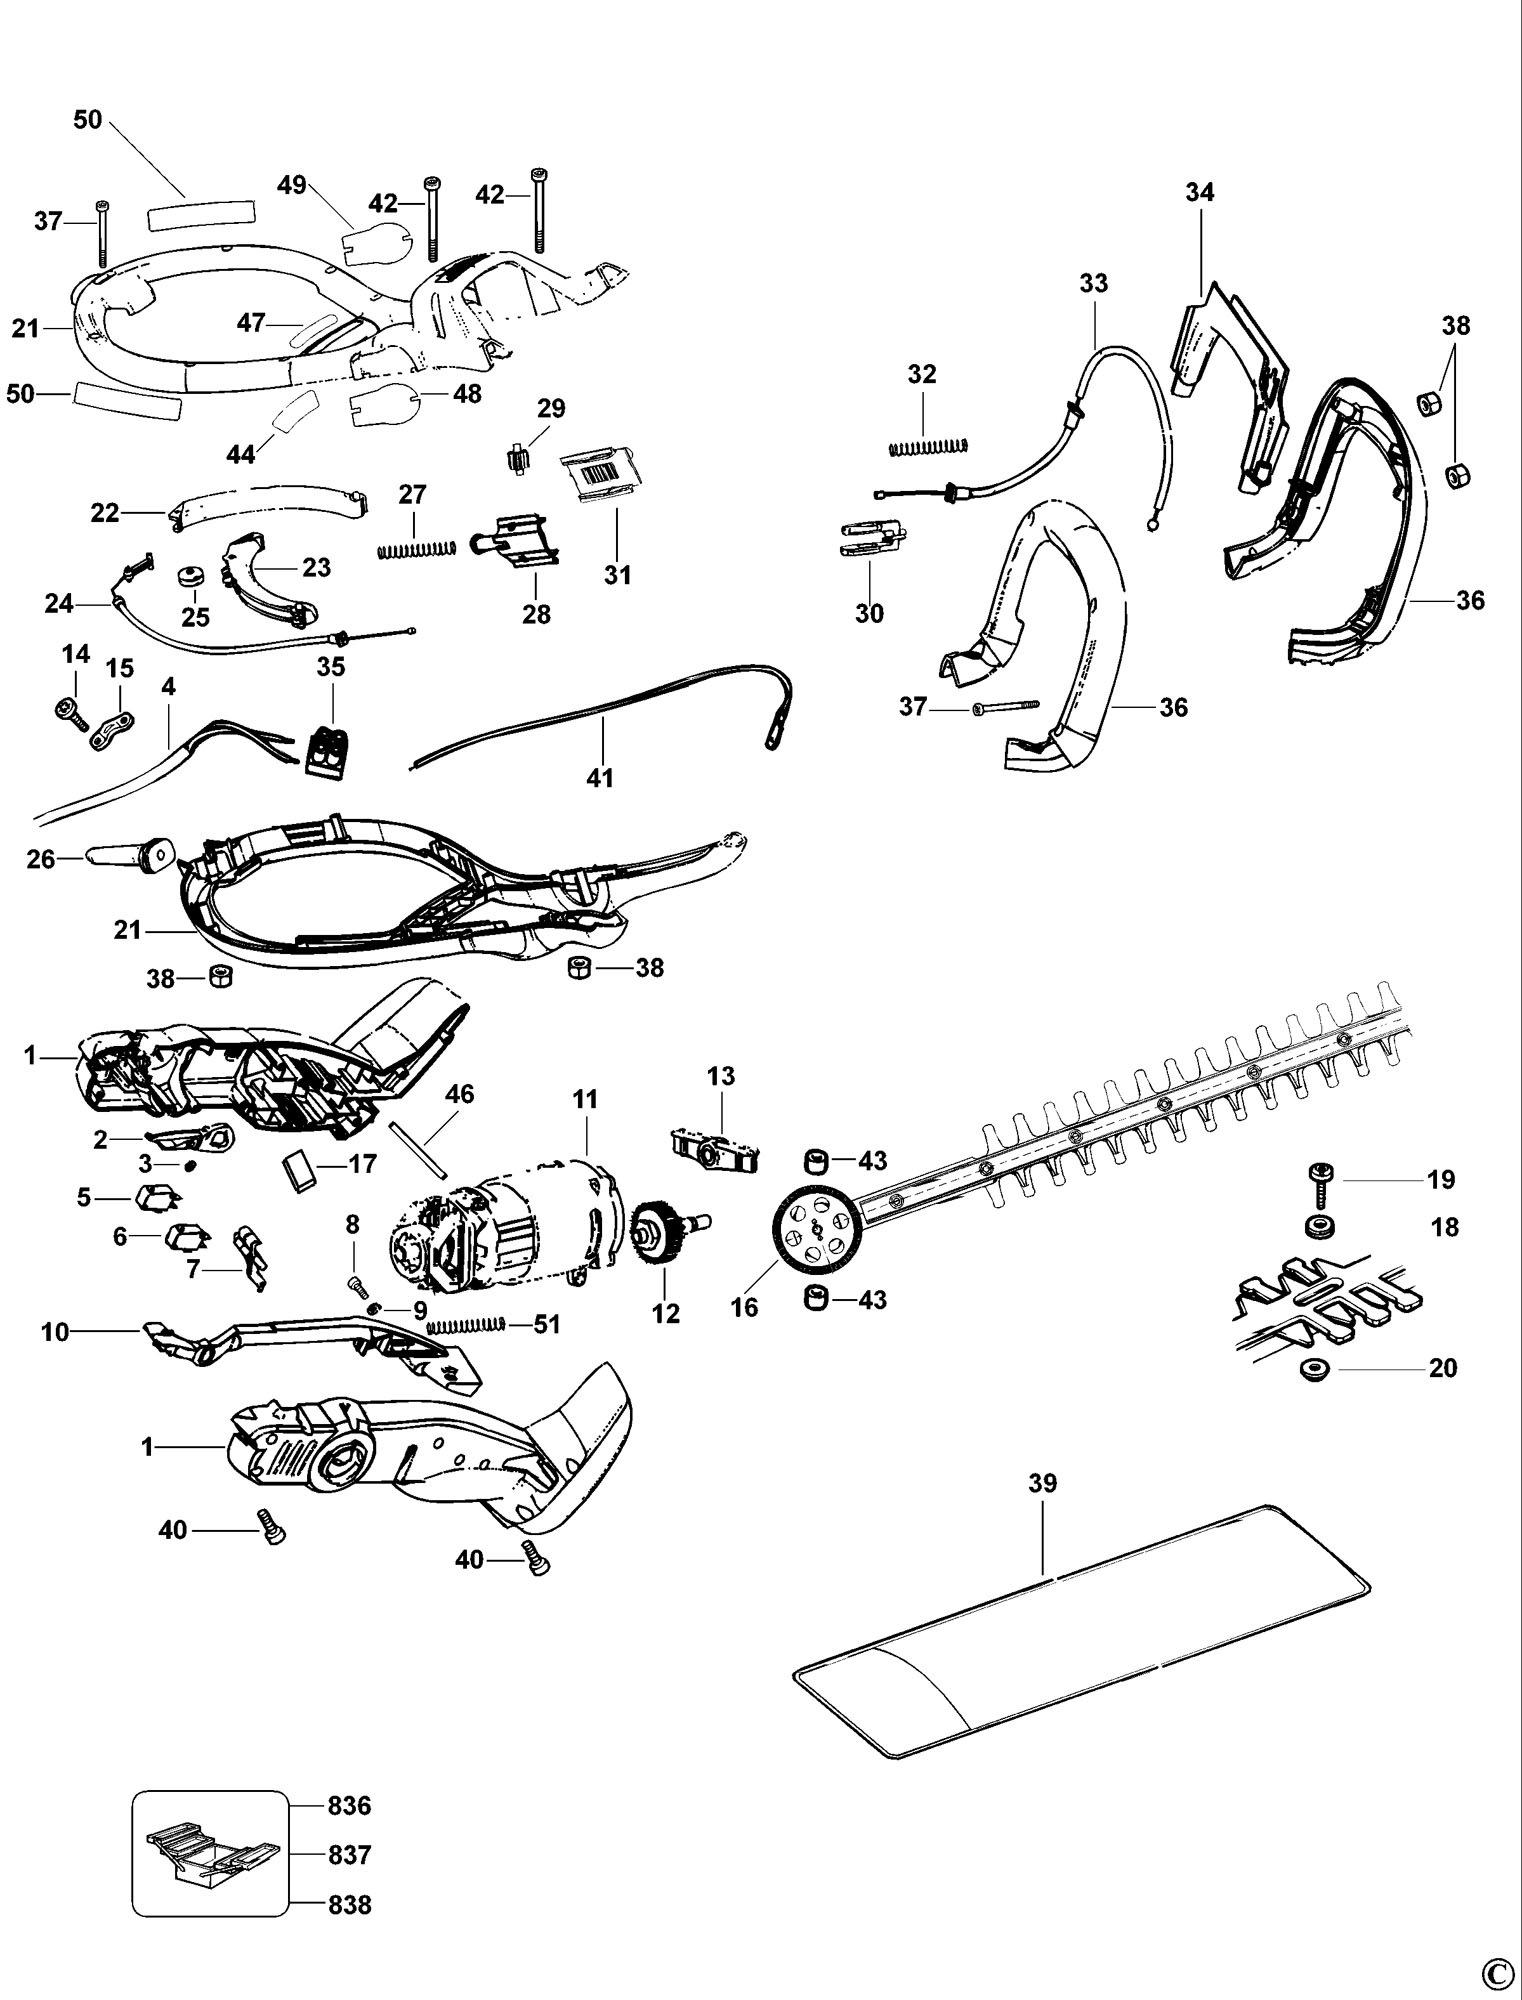 Spares For Black Amp Decker Gt370 Hedgetrimmer Type 1